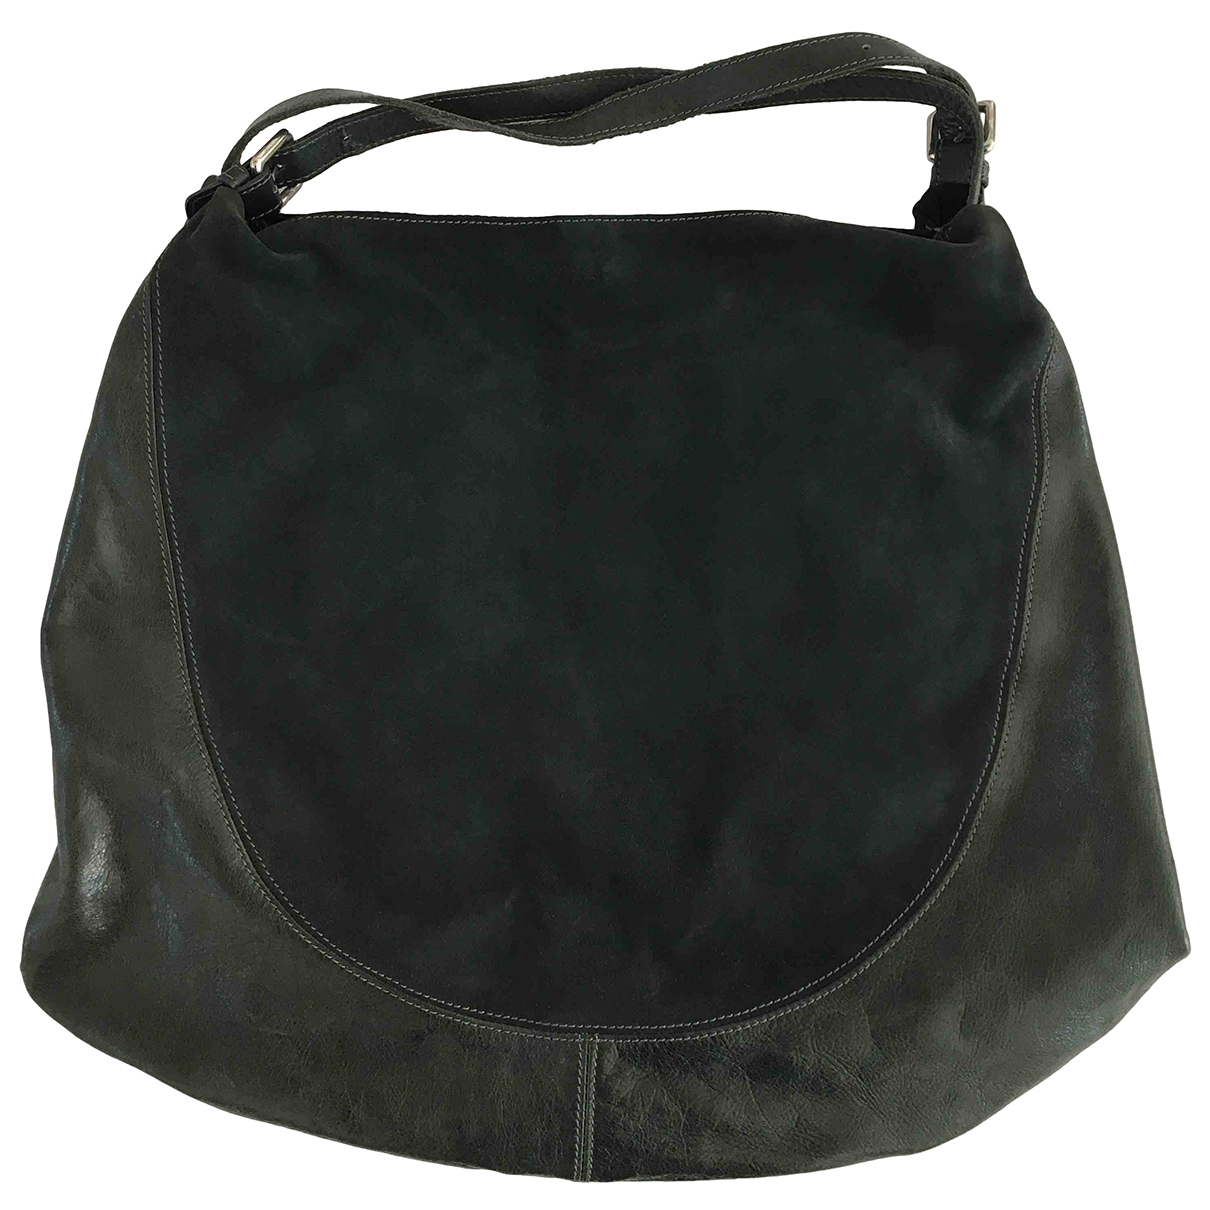 Gianni Chiarini \N Green Pony-style calfskin handbag for Women \N